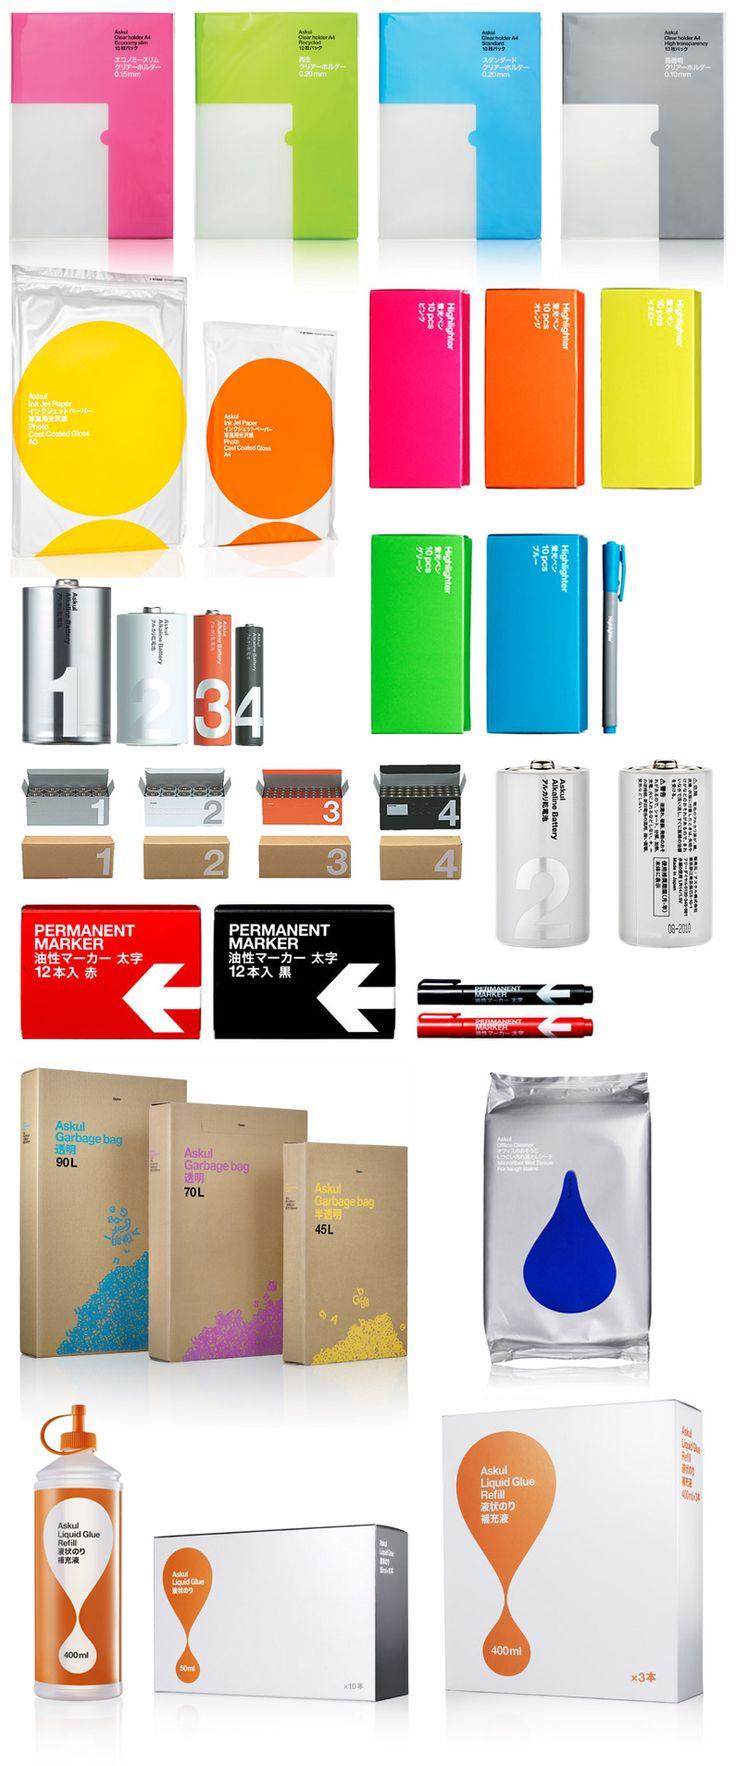 Askul Packaging / Stockholm Design Lab / minimalist design at it's finest